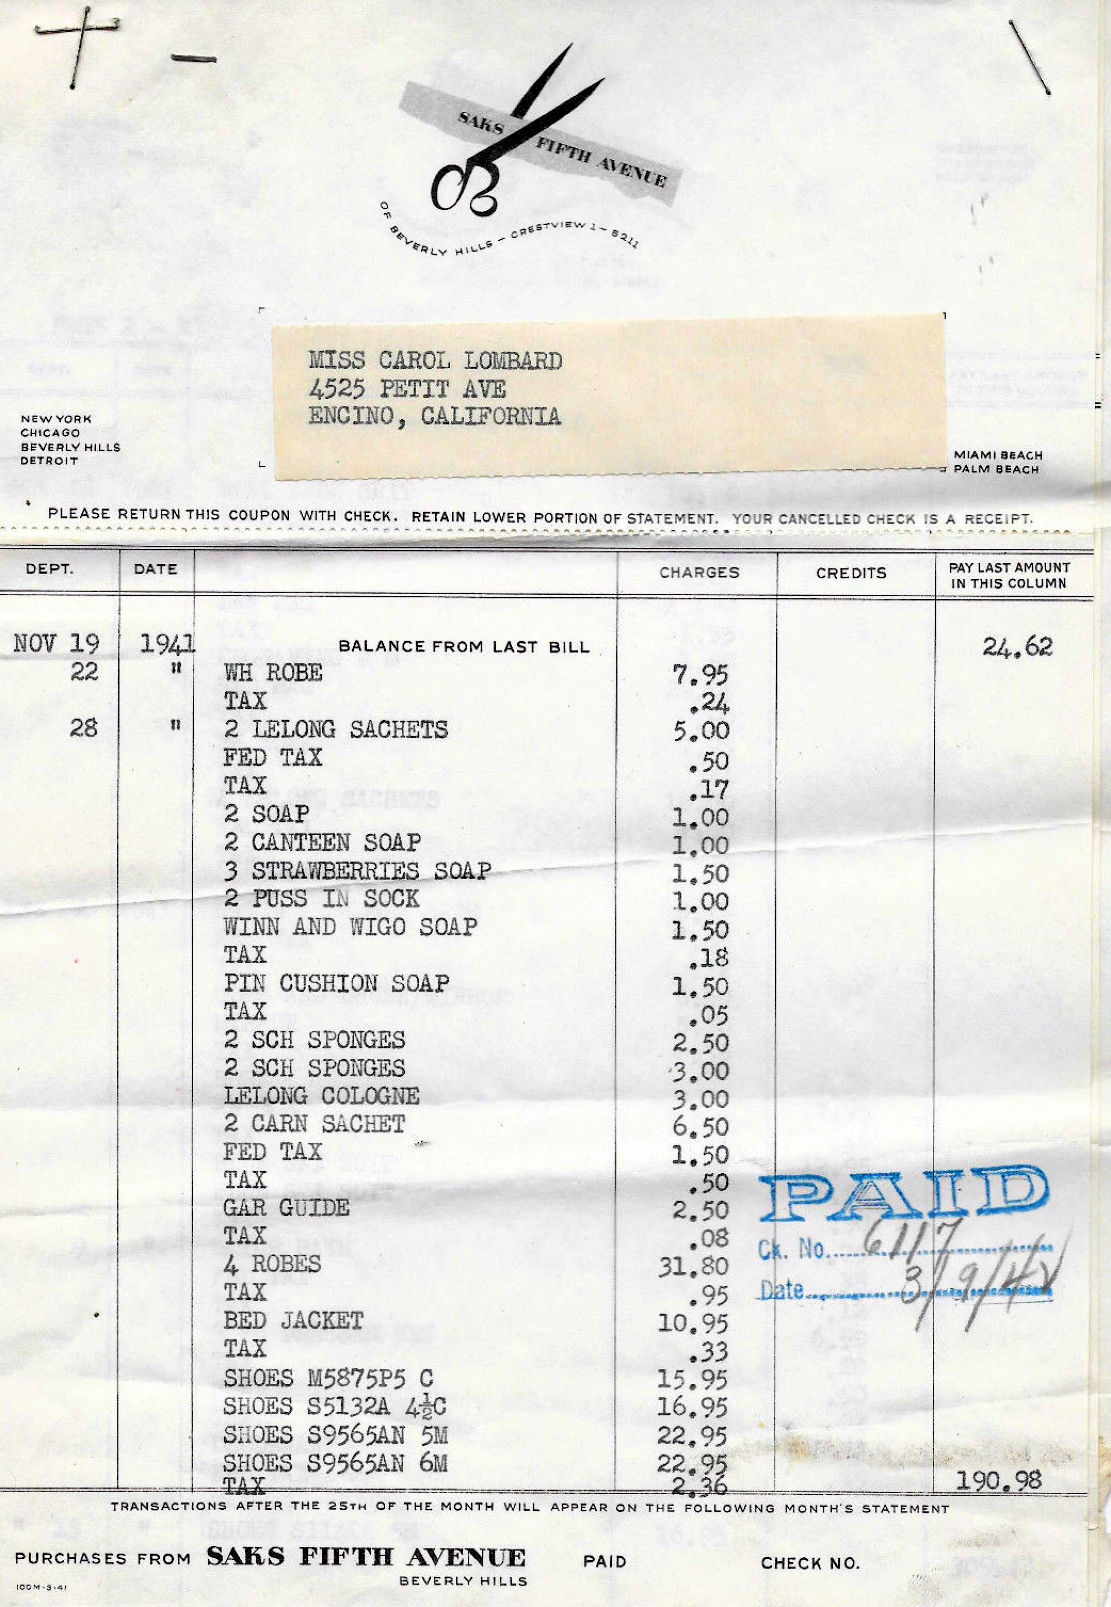 carole lombard clark gable 071542 saks estate 05a